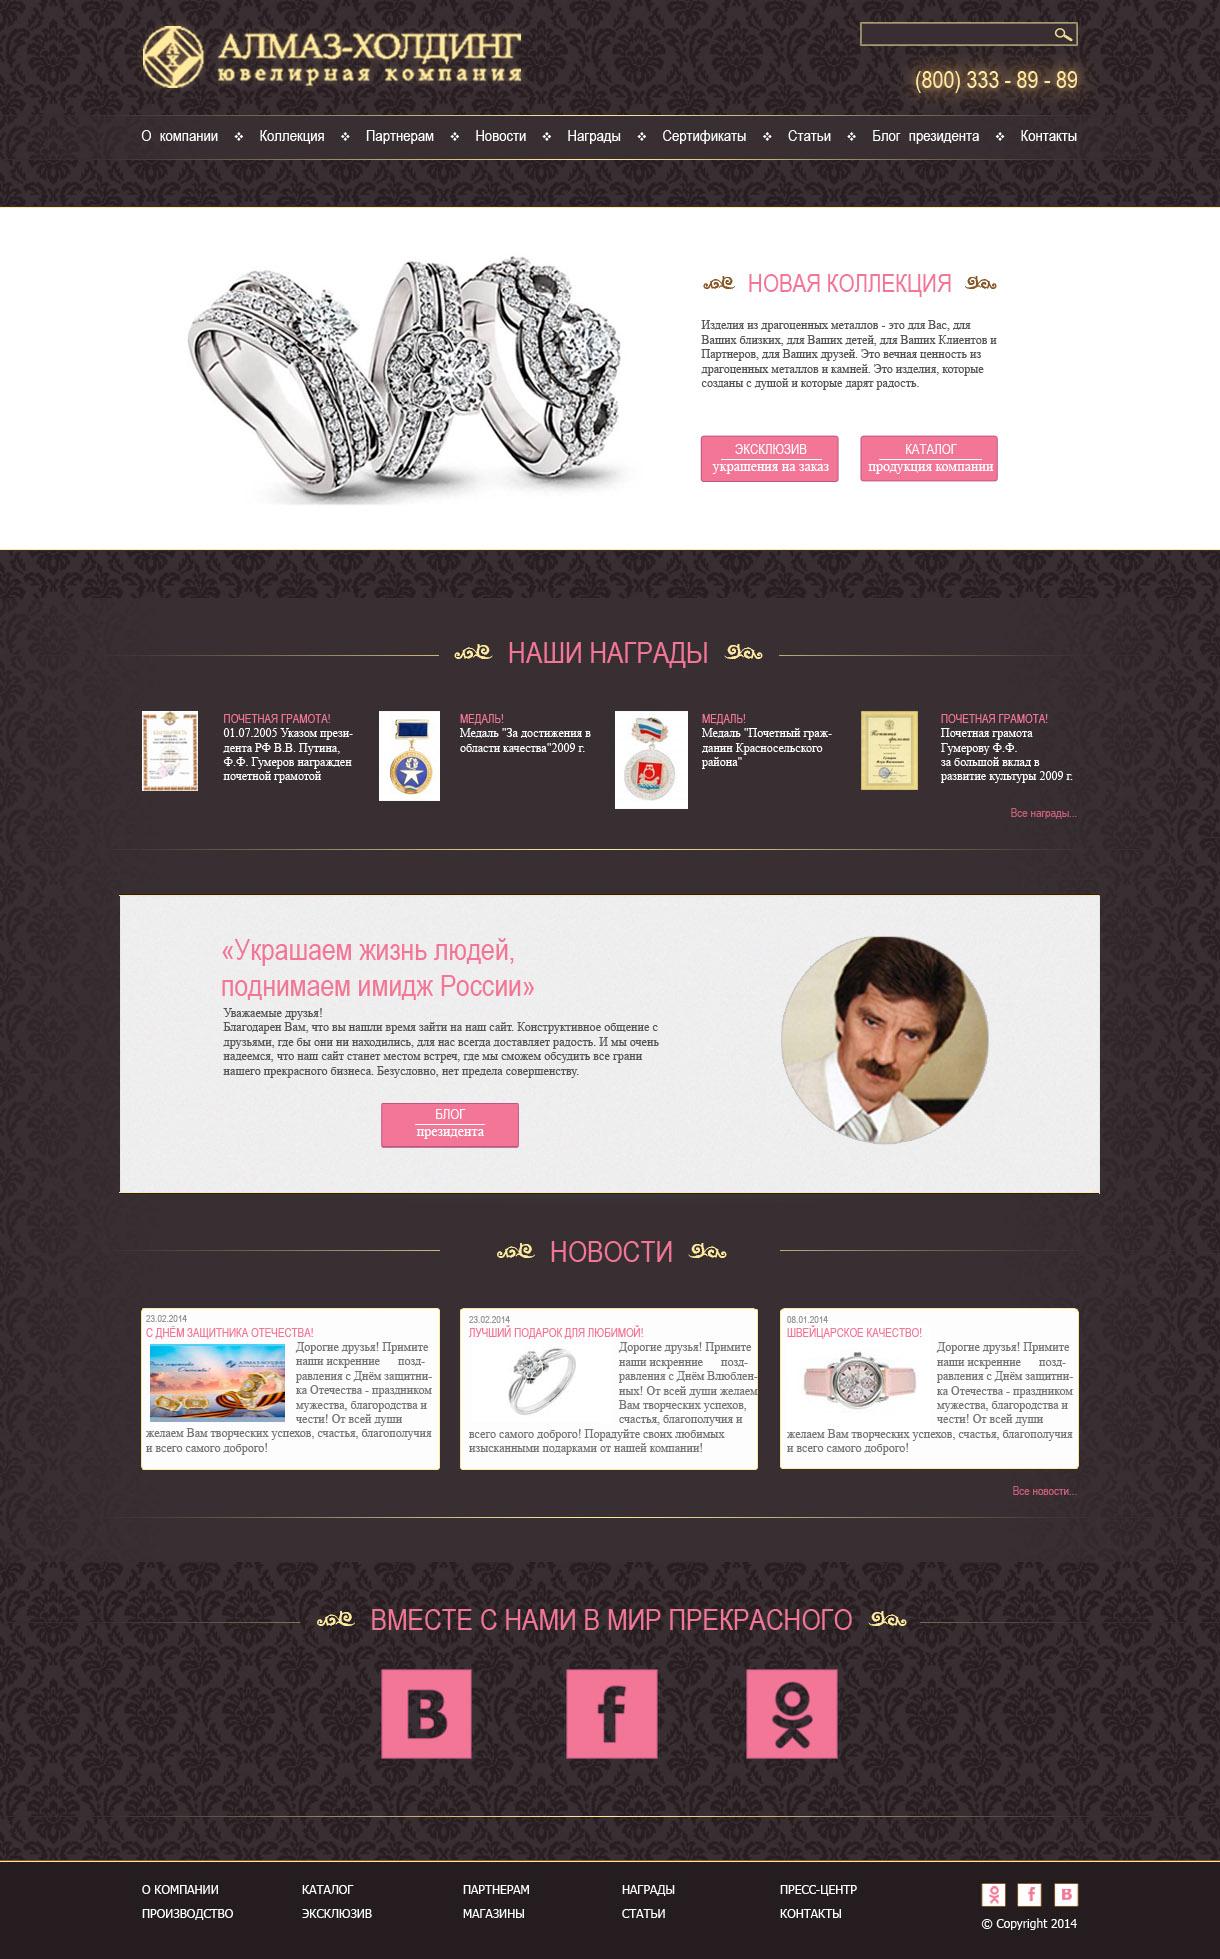 Дизайн сайта для ювелирной компании Алмаз-Холдинг фото f_608531b730dd1362.jpg